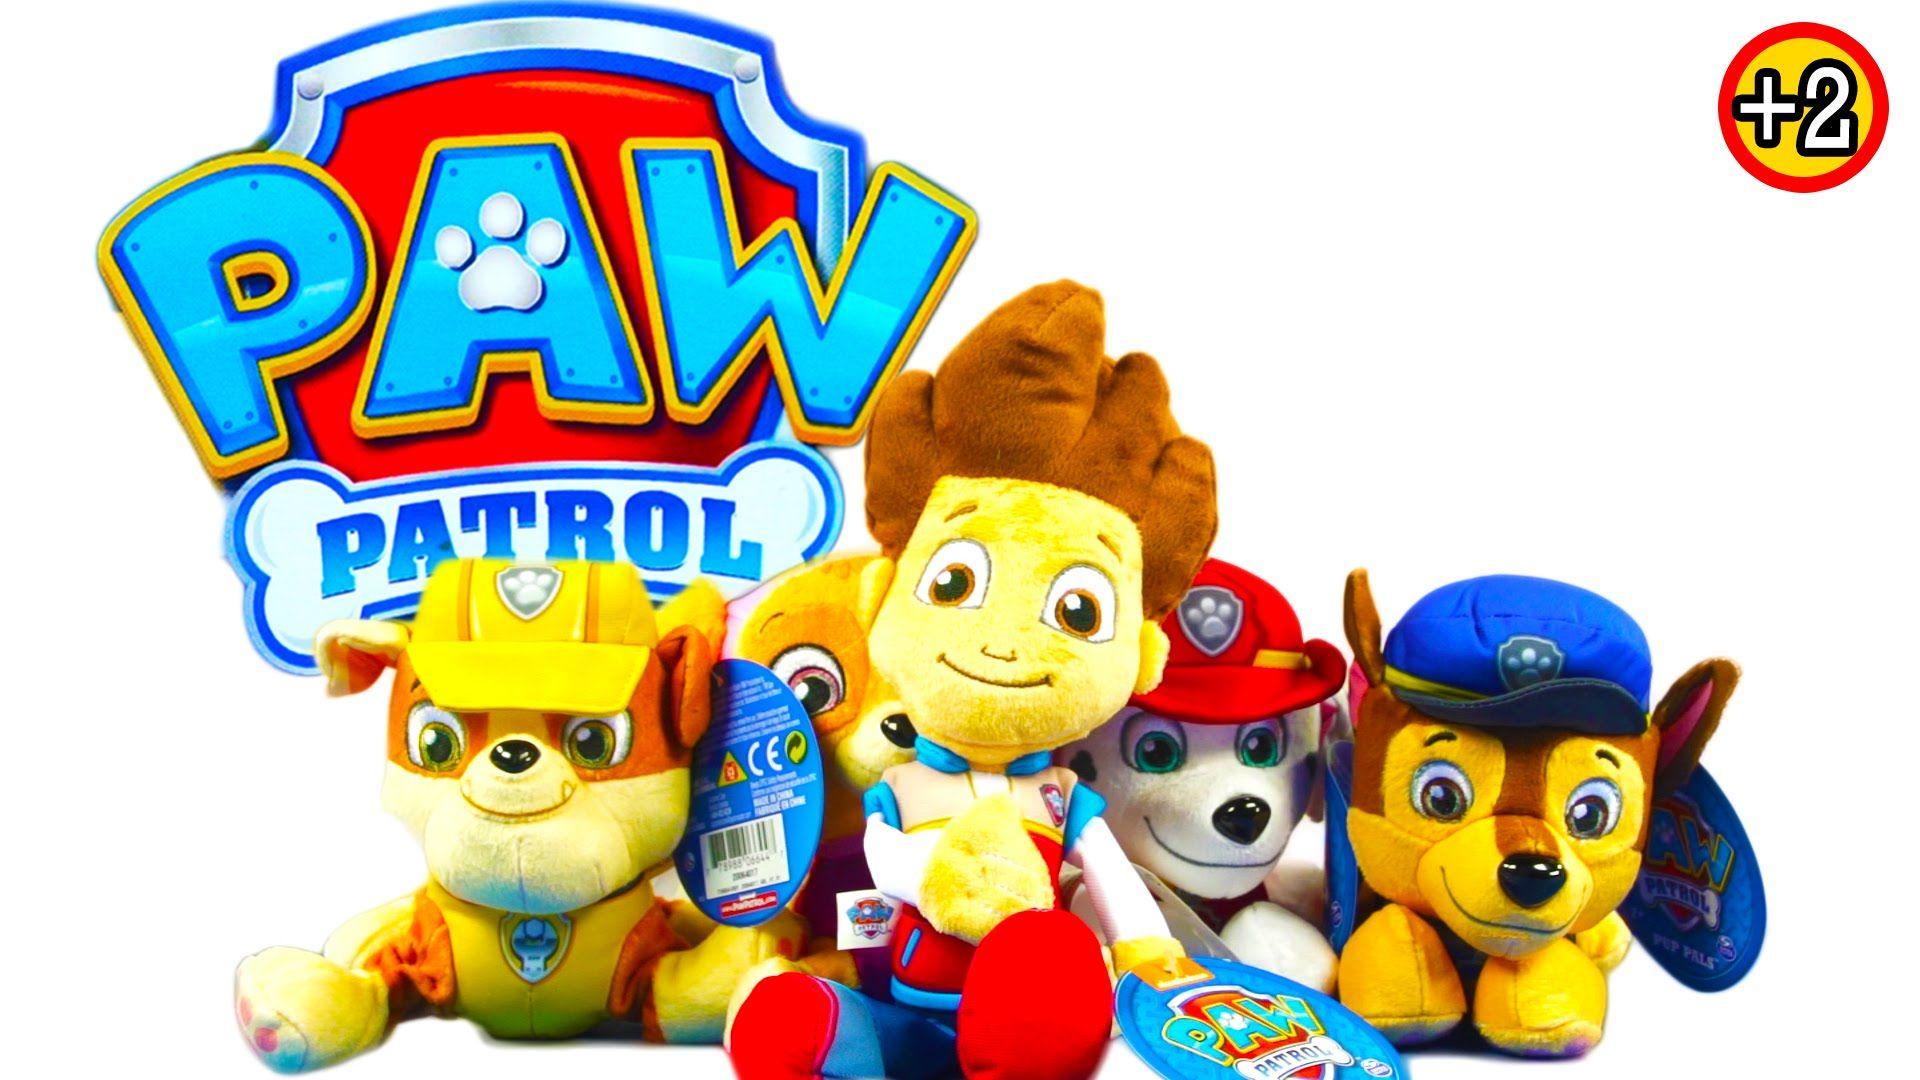 12+ Paw patrol stuffed animals ideas